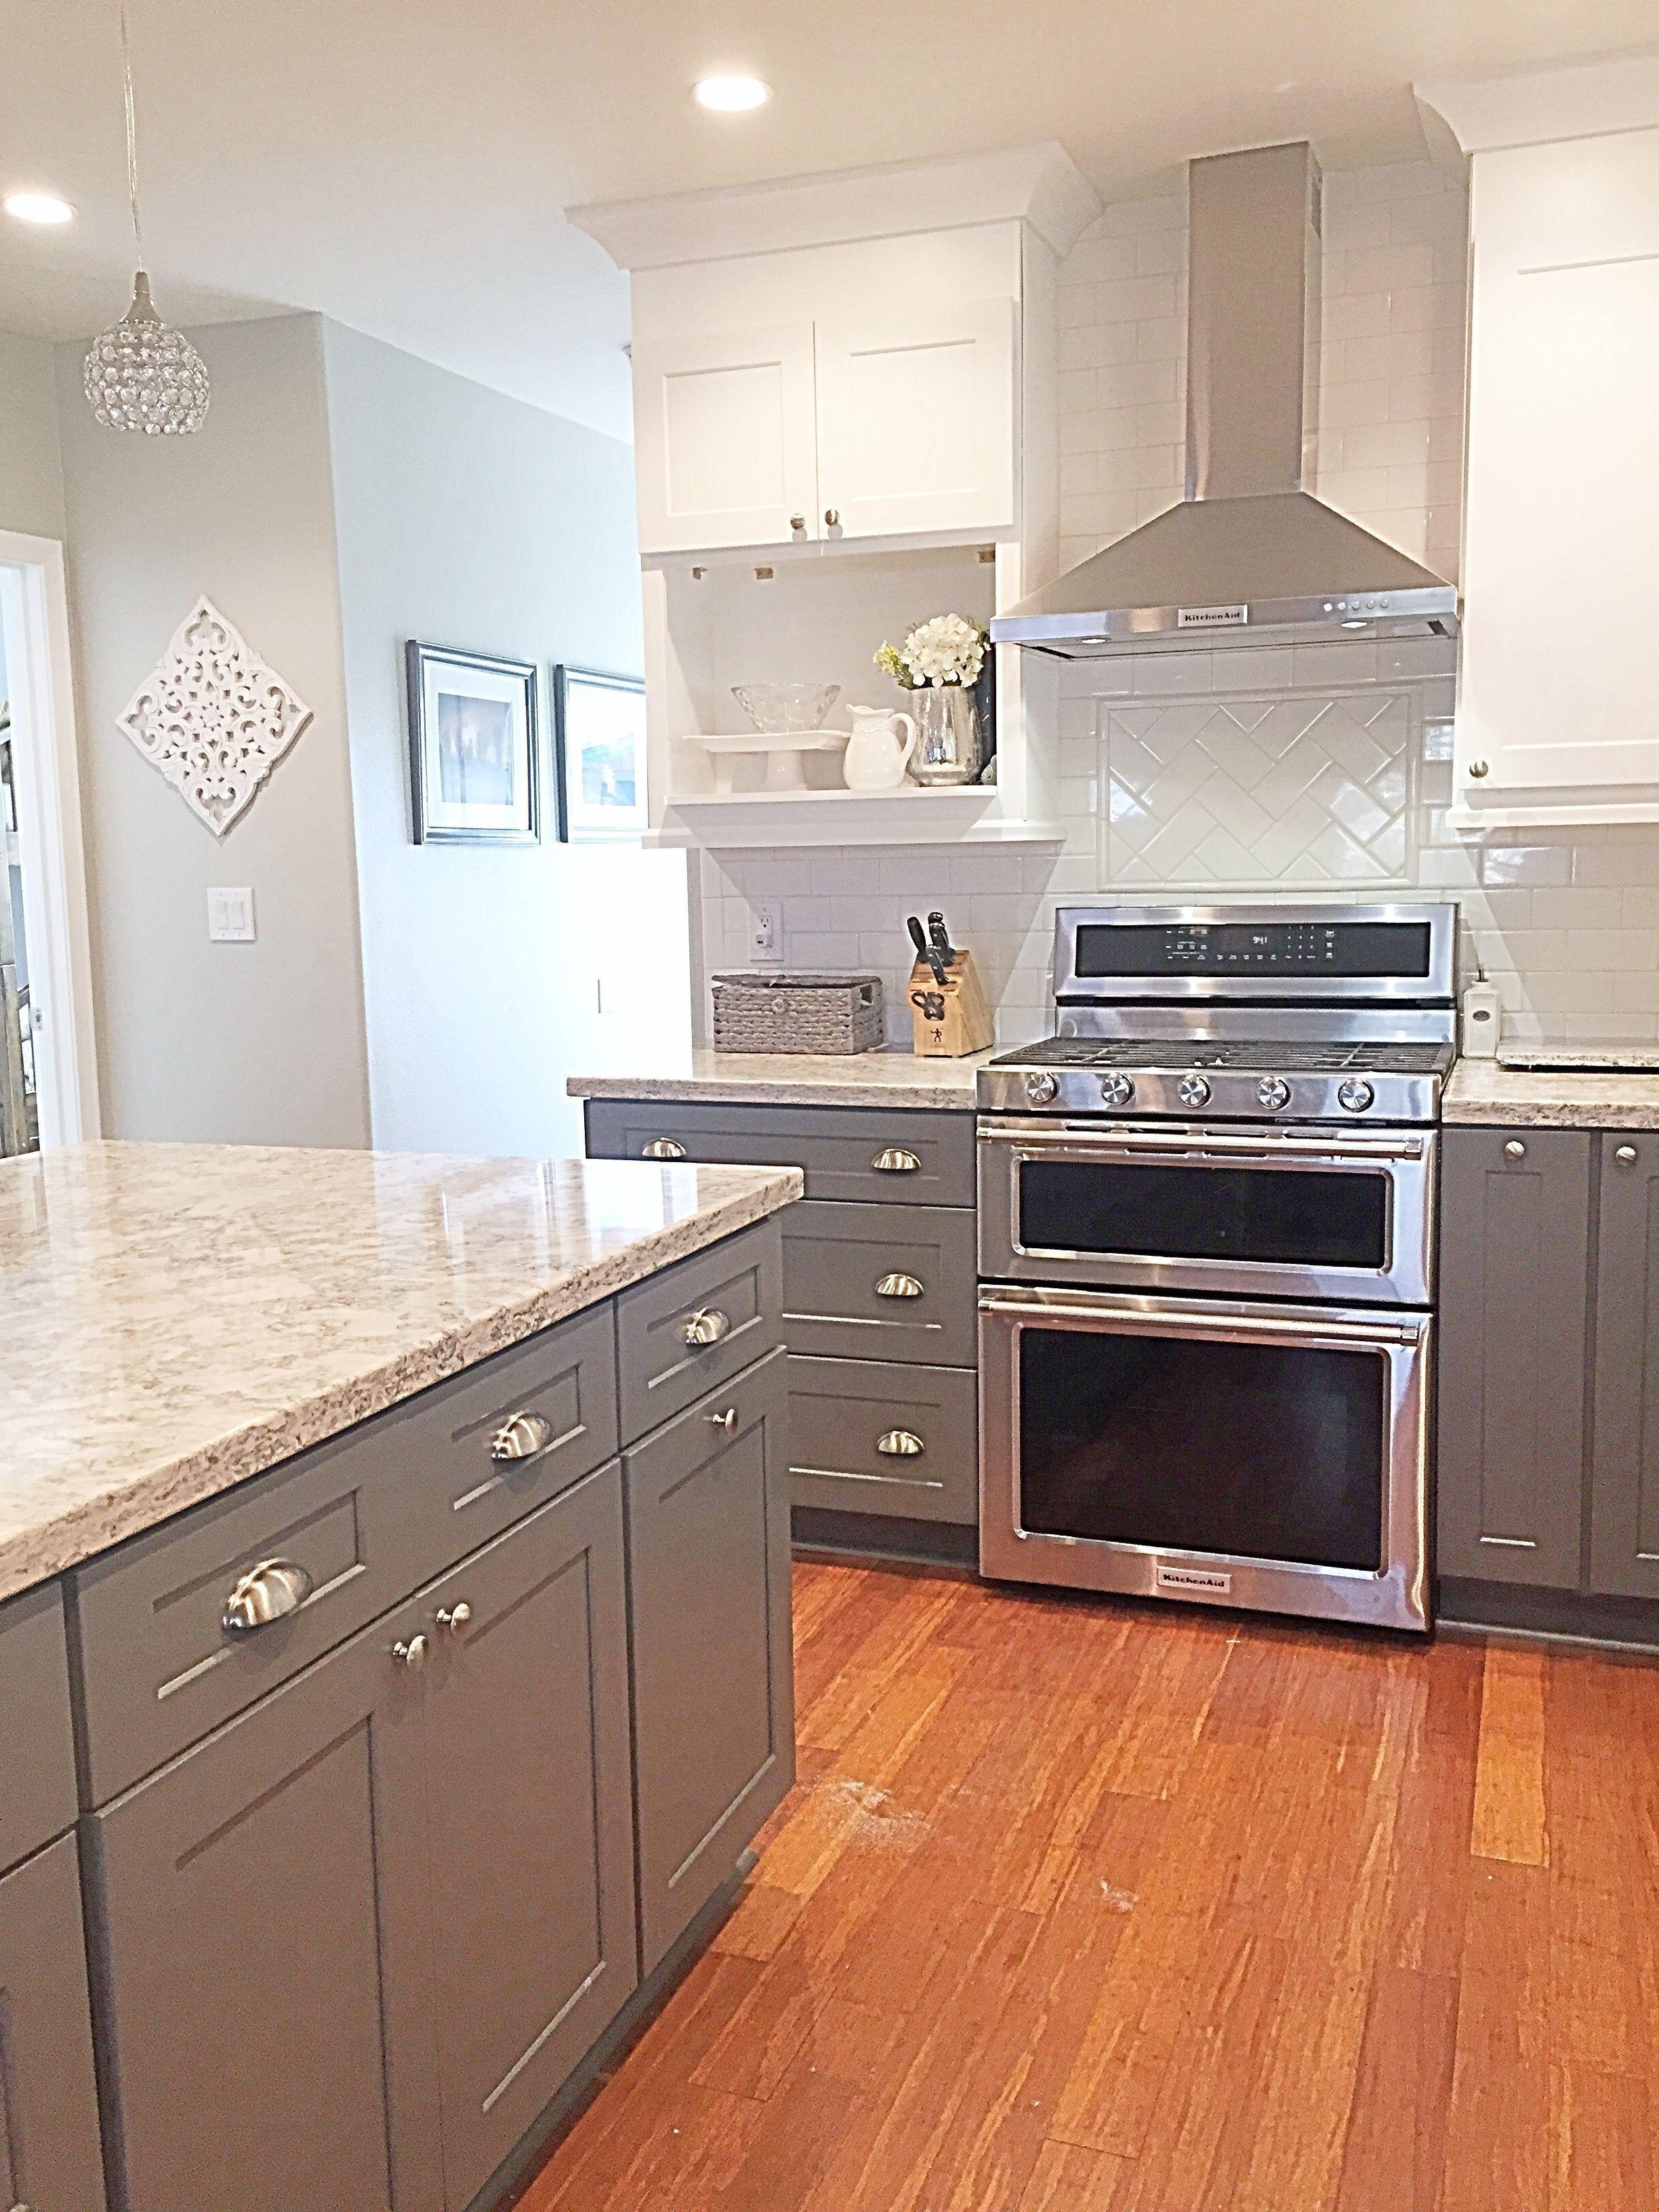 Kitchen 36 Upper Cabinets In 8 Ceiling Standard Upper Cabinet Depth 48 Tall Kitchen Wall Cabinets Kitchen Layout Small L Shaped Kitchens Tall Kitchen Cabinets